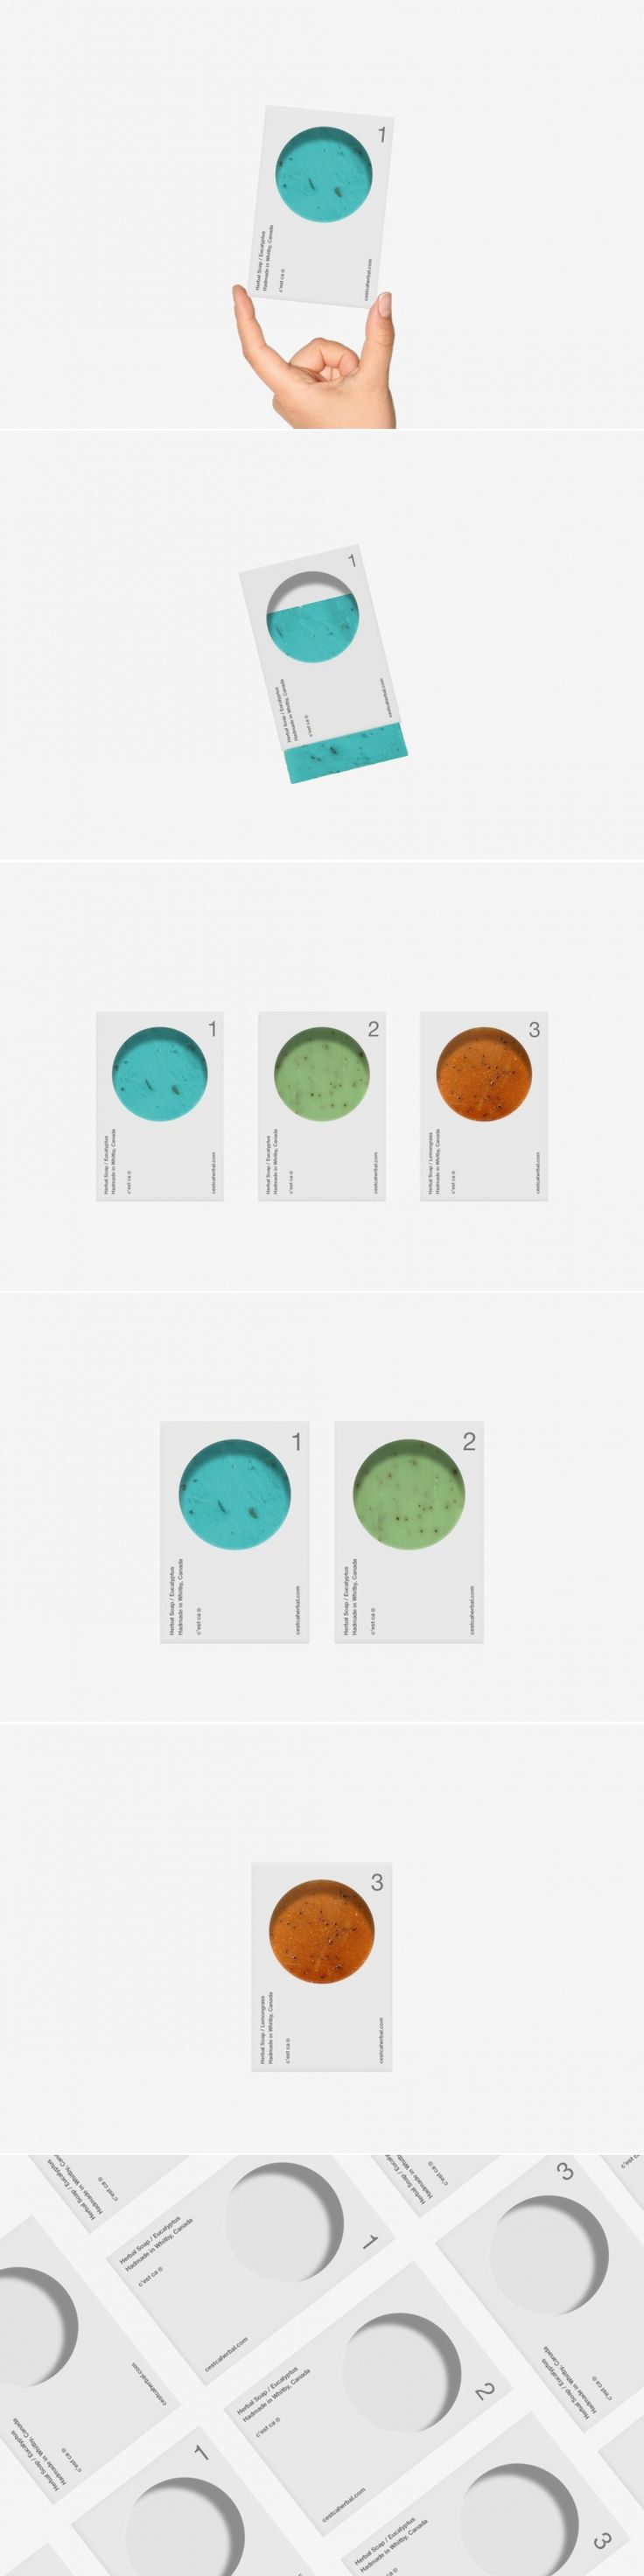 C'est Ça Herbal Soap — The Dieline - Branding & Packaging Design